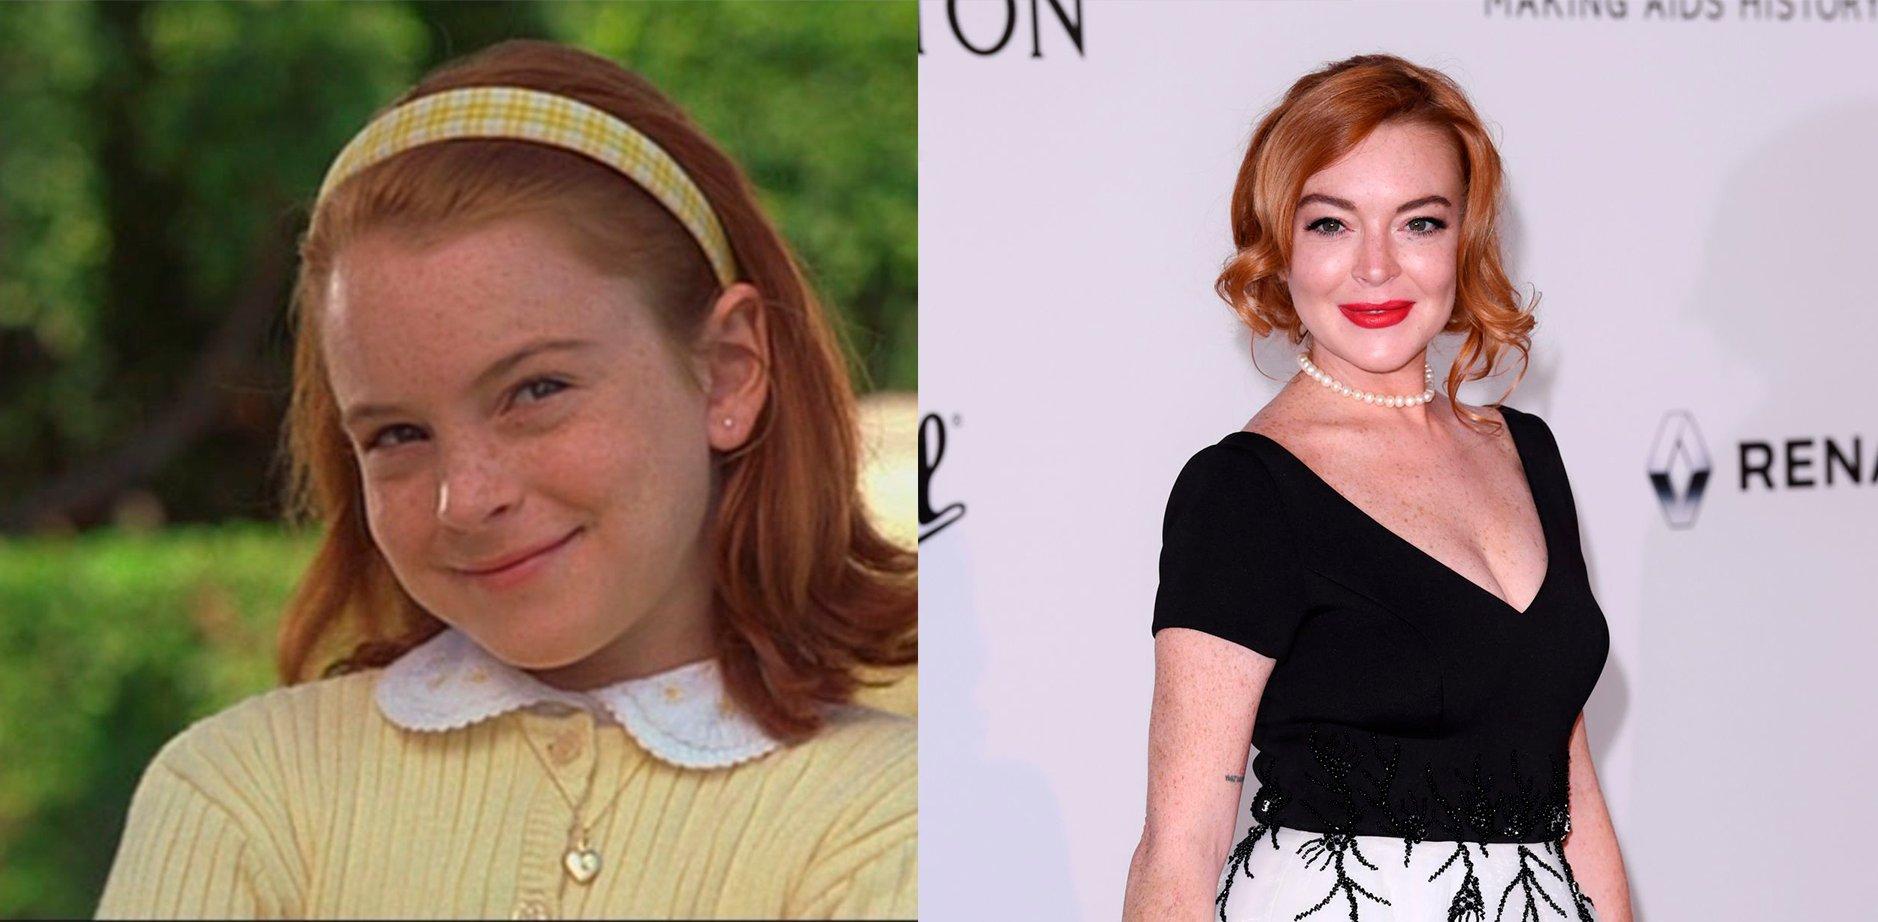 Actrices Americanas Rubias 10 famosas chicas de disney que han cambiado radicalmente